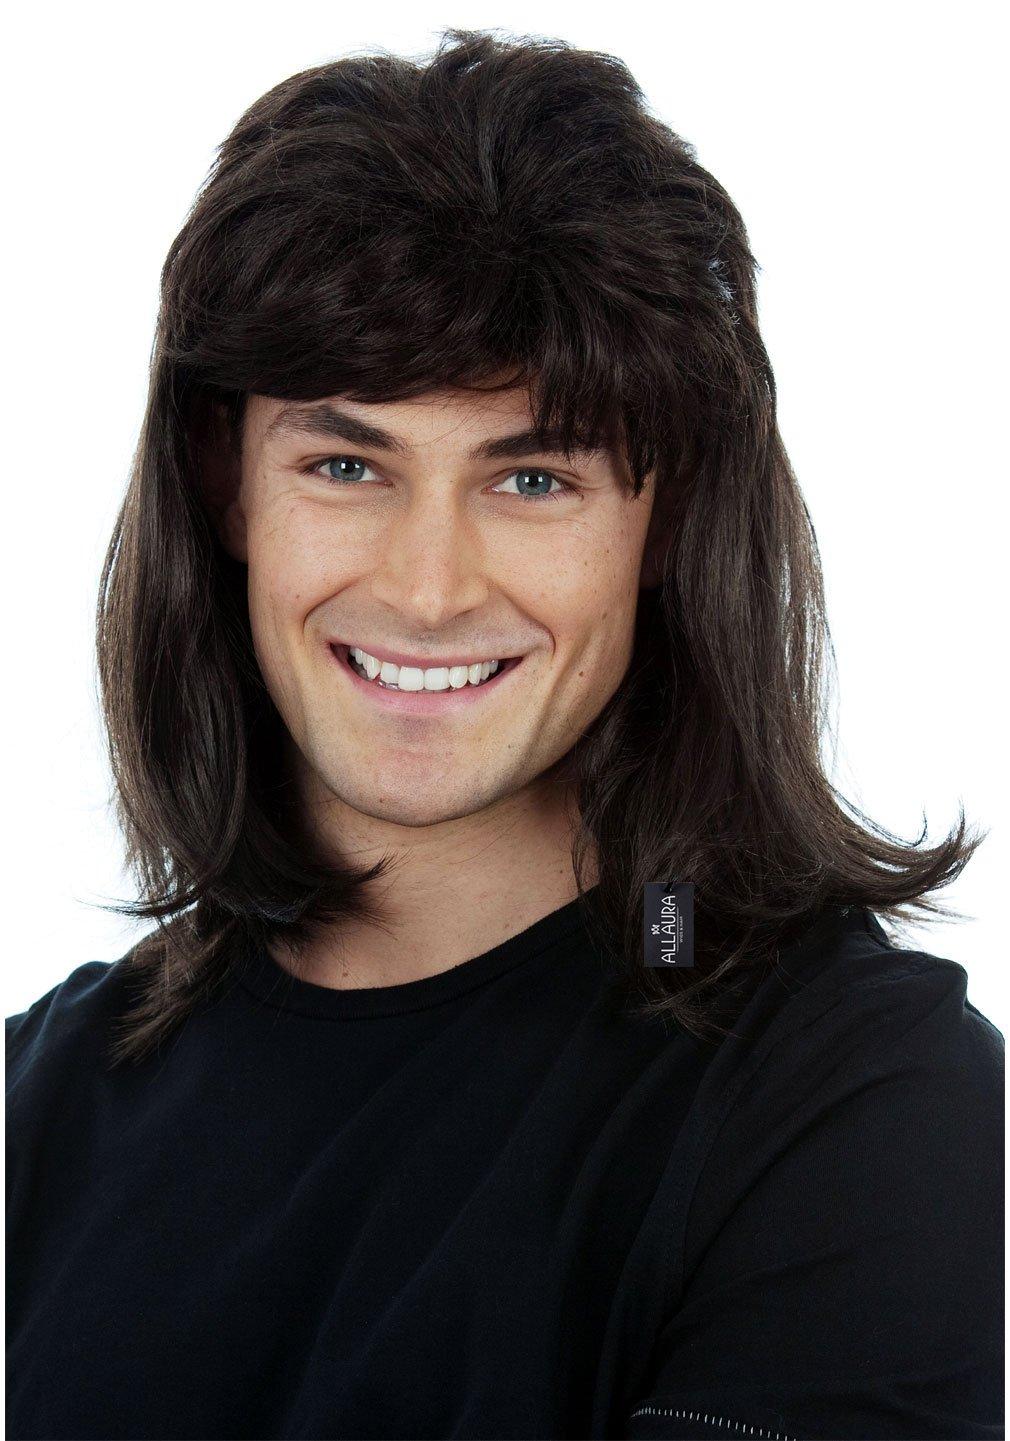 ALLAURA Waynes World Wig – Wayne Campbell Hair – Black Mullet Wigs for Men 80s Redneck